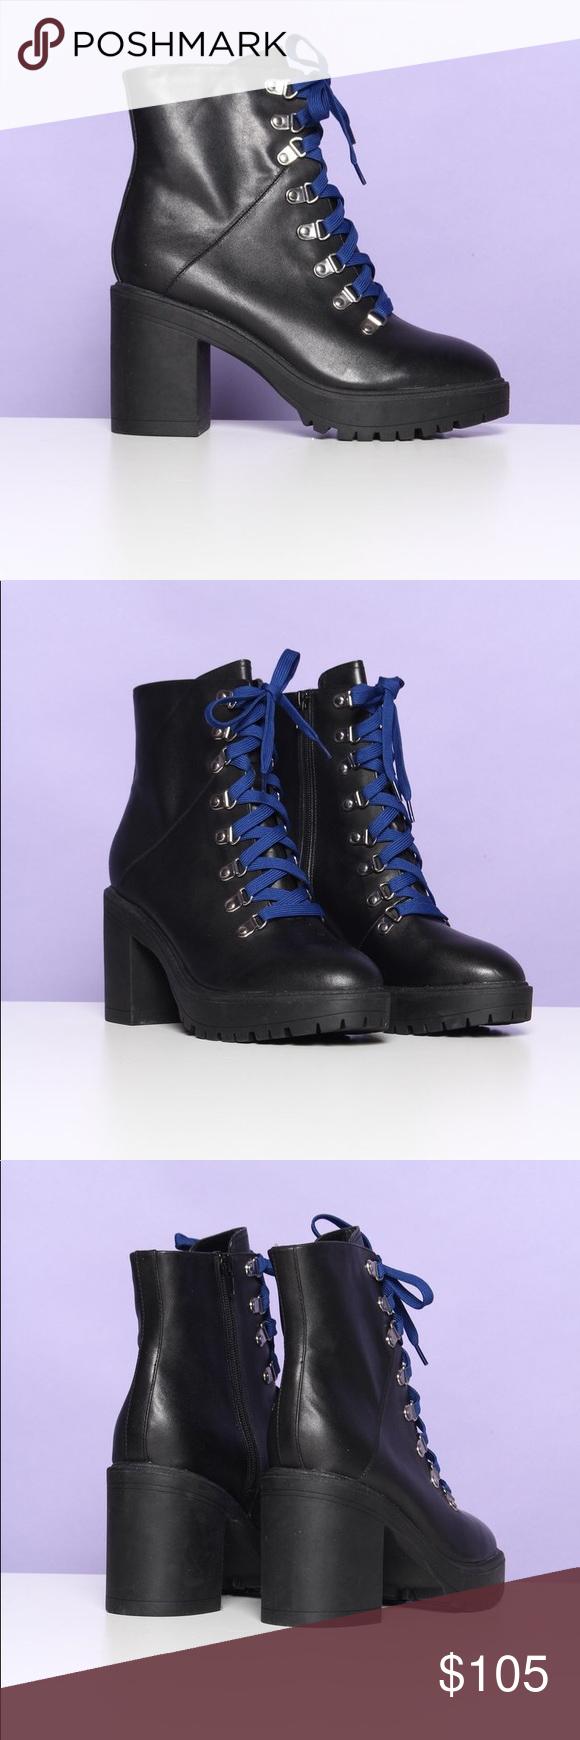 7964cd2cabb Steve Madden Shoes | Steve Madden Royce Leather Heels Hiker Boots ...